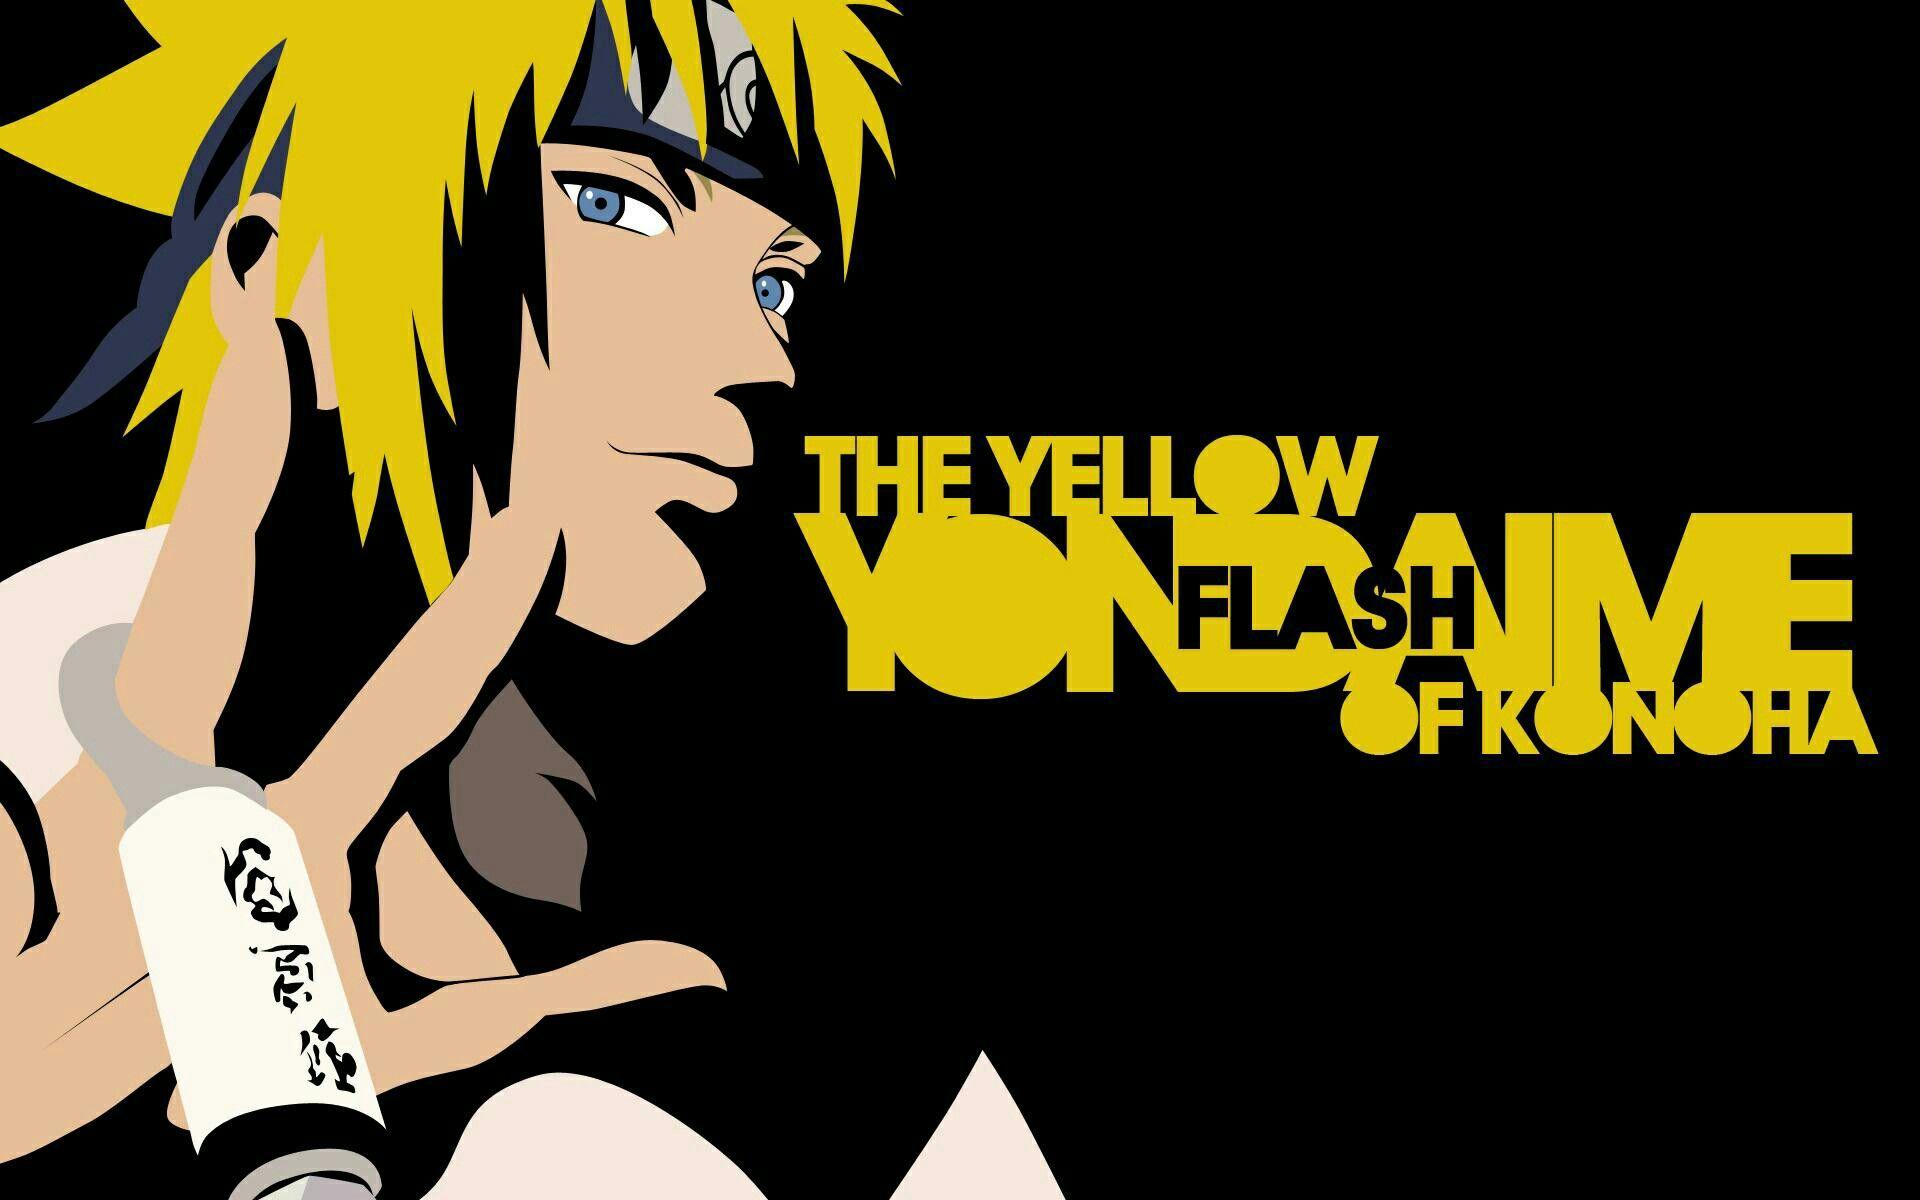 Fantastic Wallpaper Naruto Yellow - 61e847d7cbd547ce3ee98e1464a6e1ac  Image.jpg